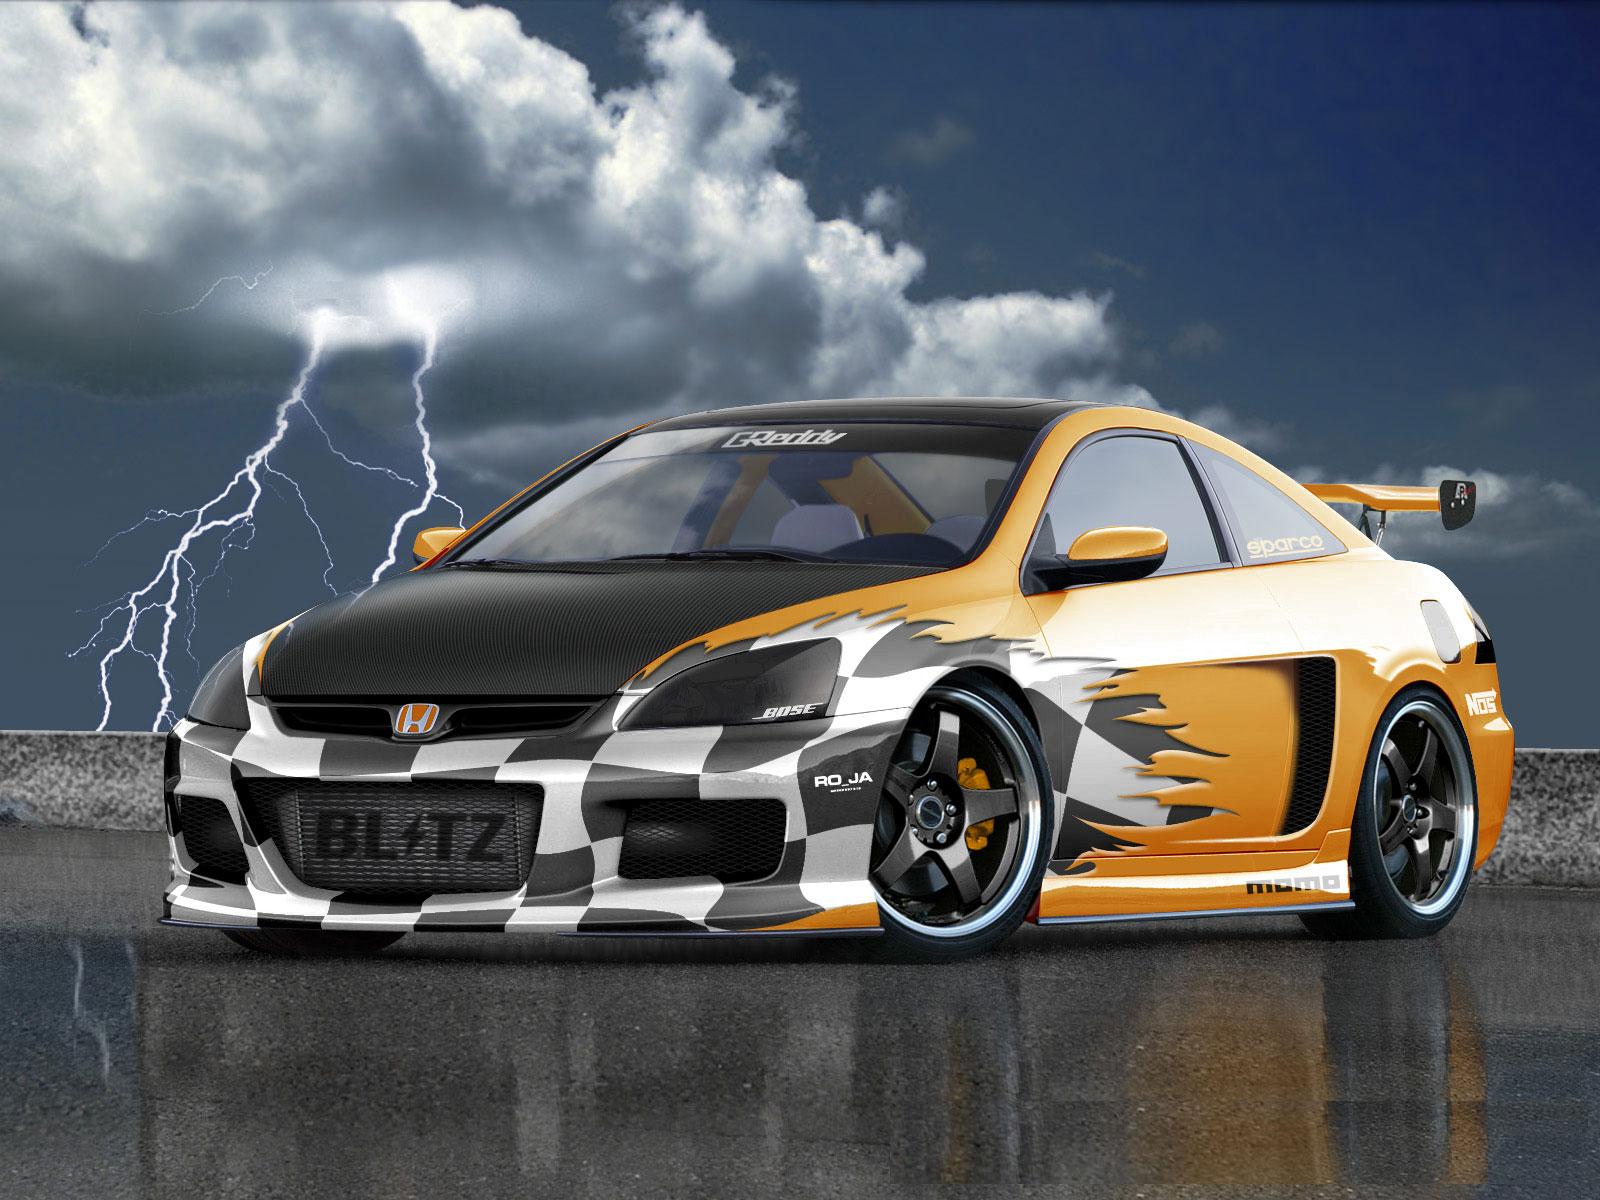 Allinallwalls Car Wallpapers 2014 Iphone Car Fast Cool: [50+] Cool Car Wallpapers For IPhone On WallpaperSafari